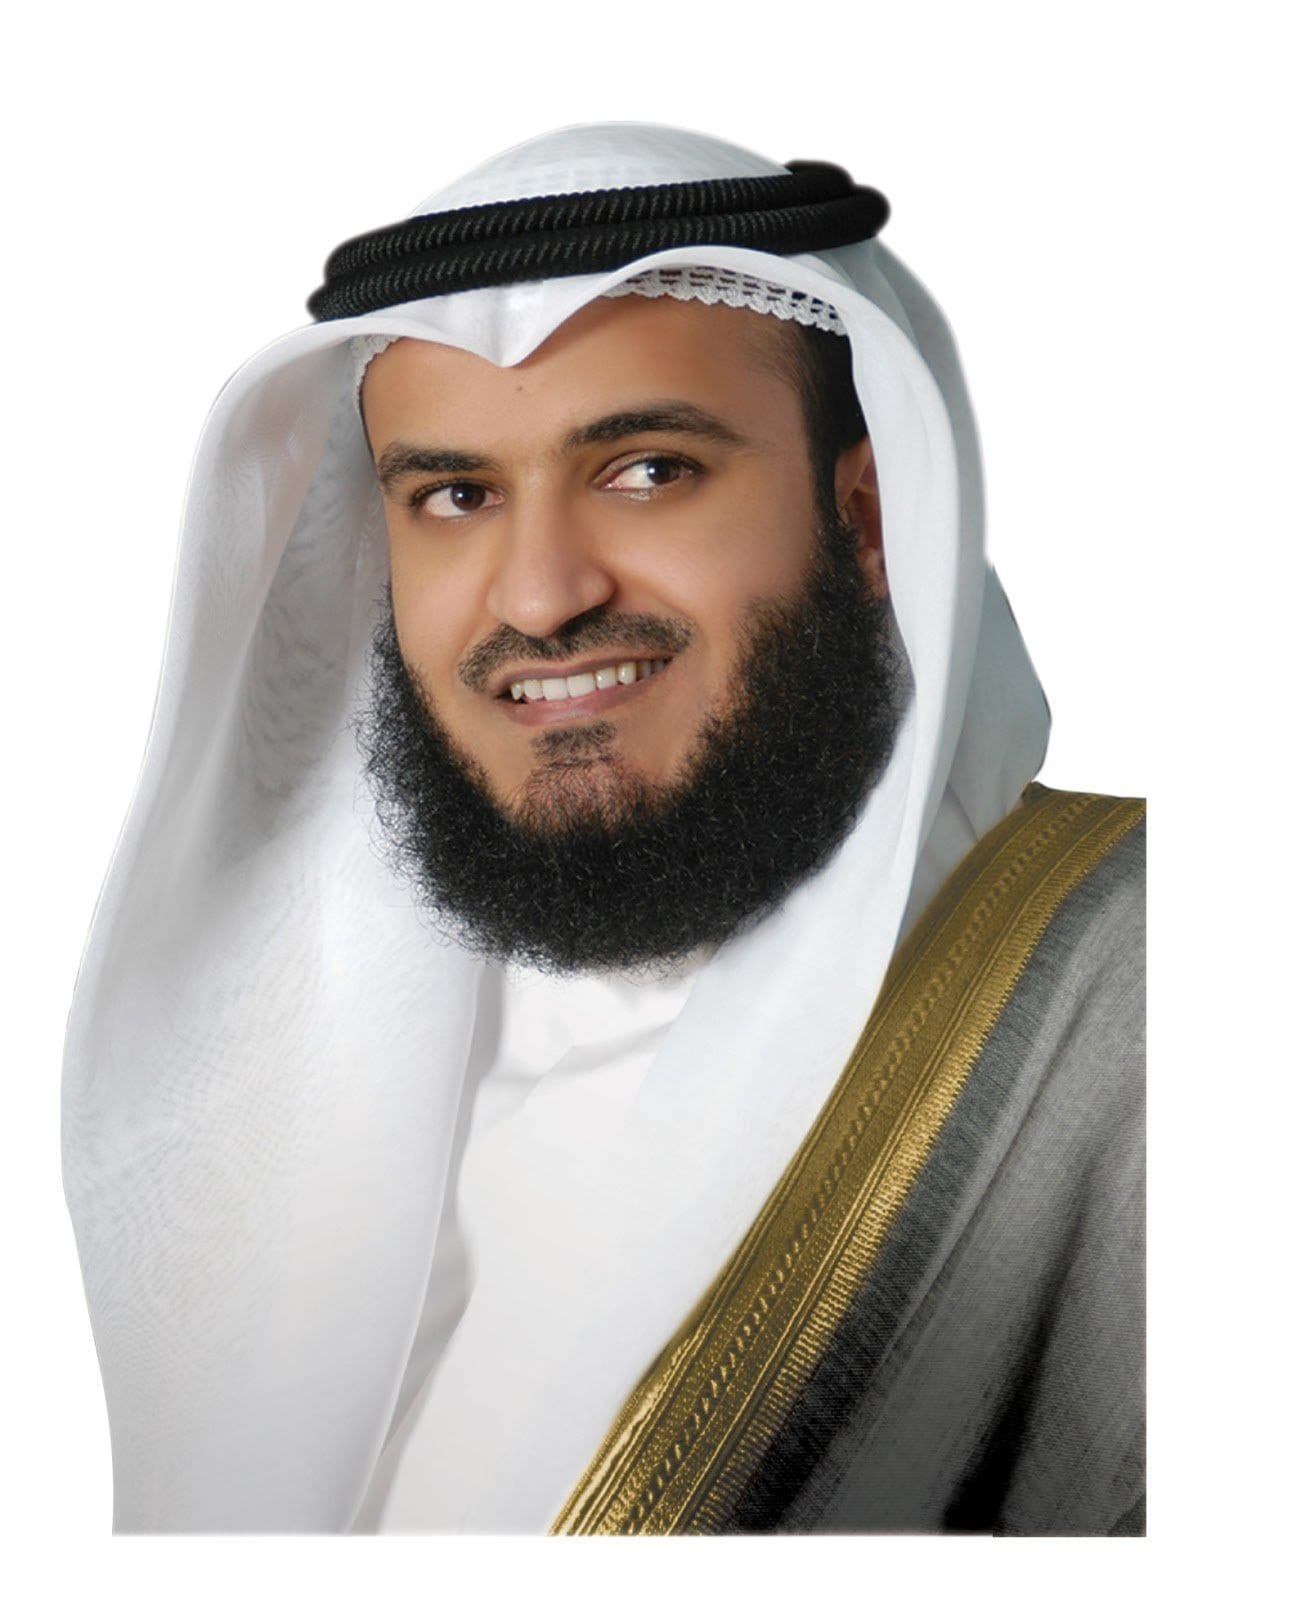 Arabic Beard Styles 2